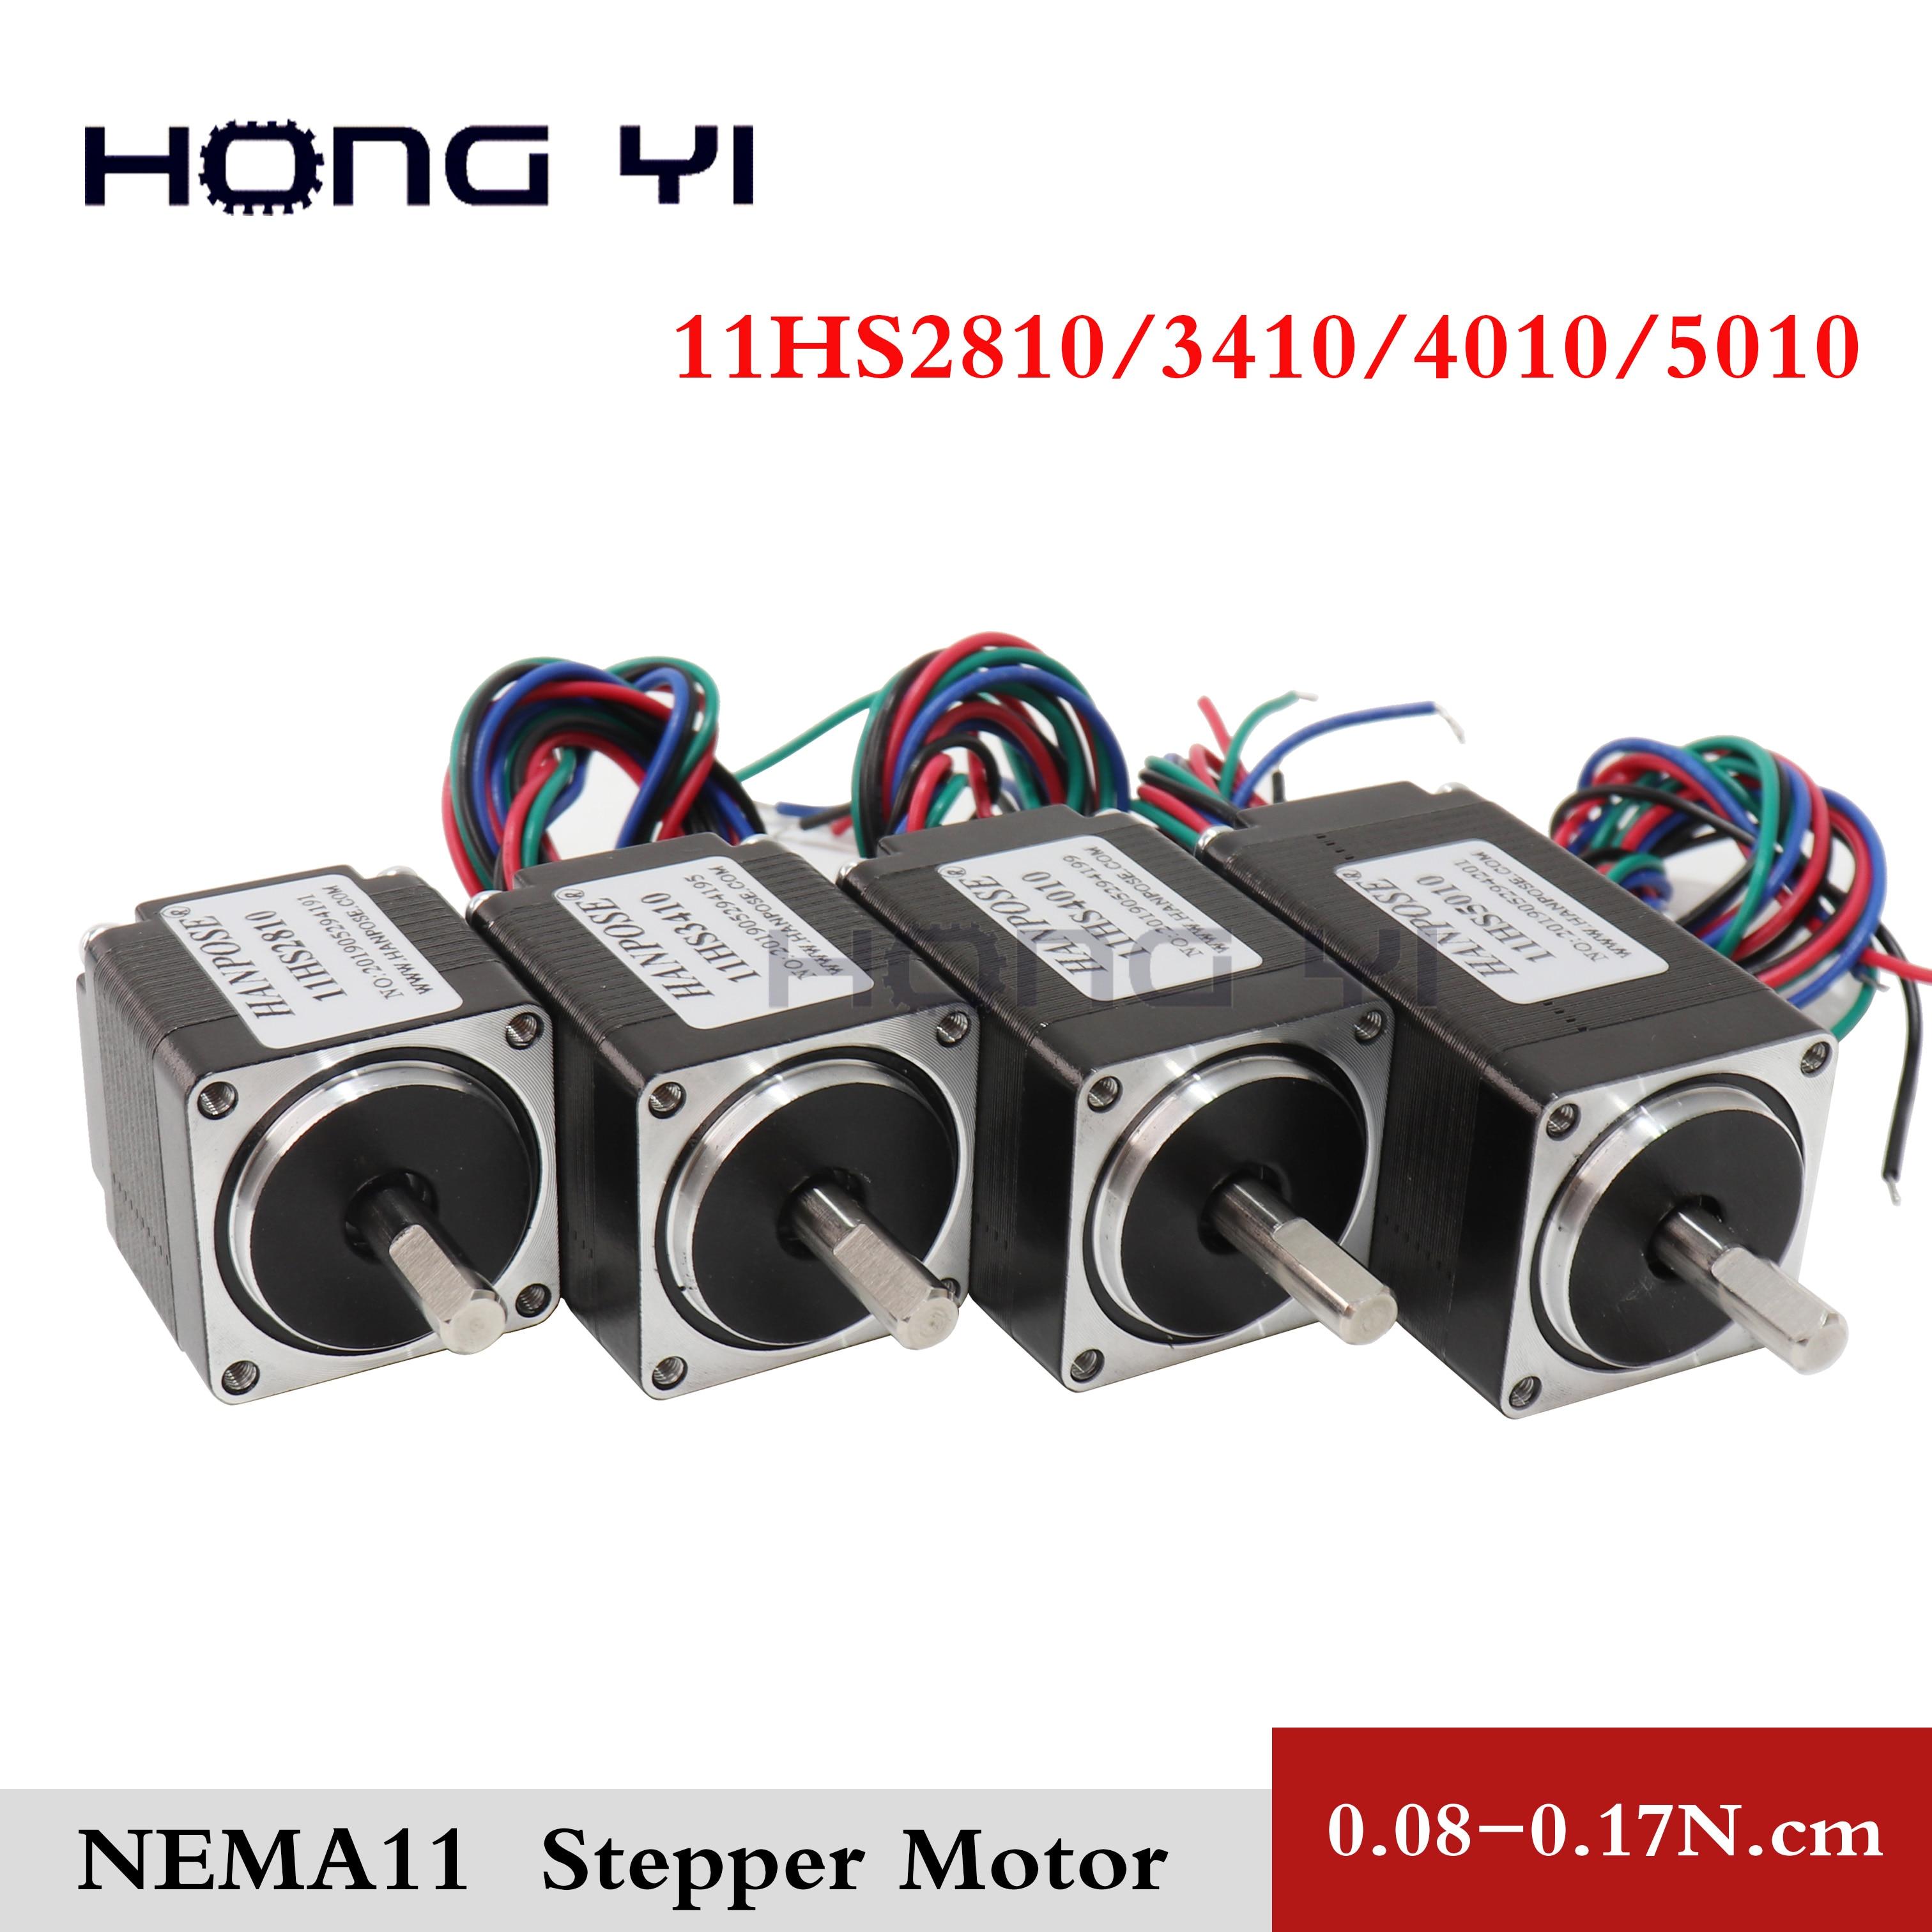 11HS2810 3410, 4010 de 5010 NEMA11 motor paso a paso híbrido 28x28x28mm de dos fases 4 cables de 1,8 grados para nuevo CNC router